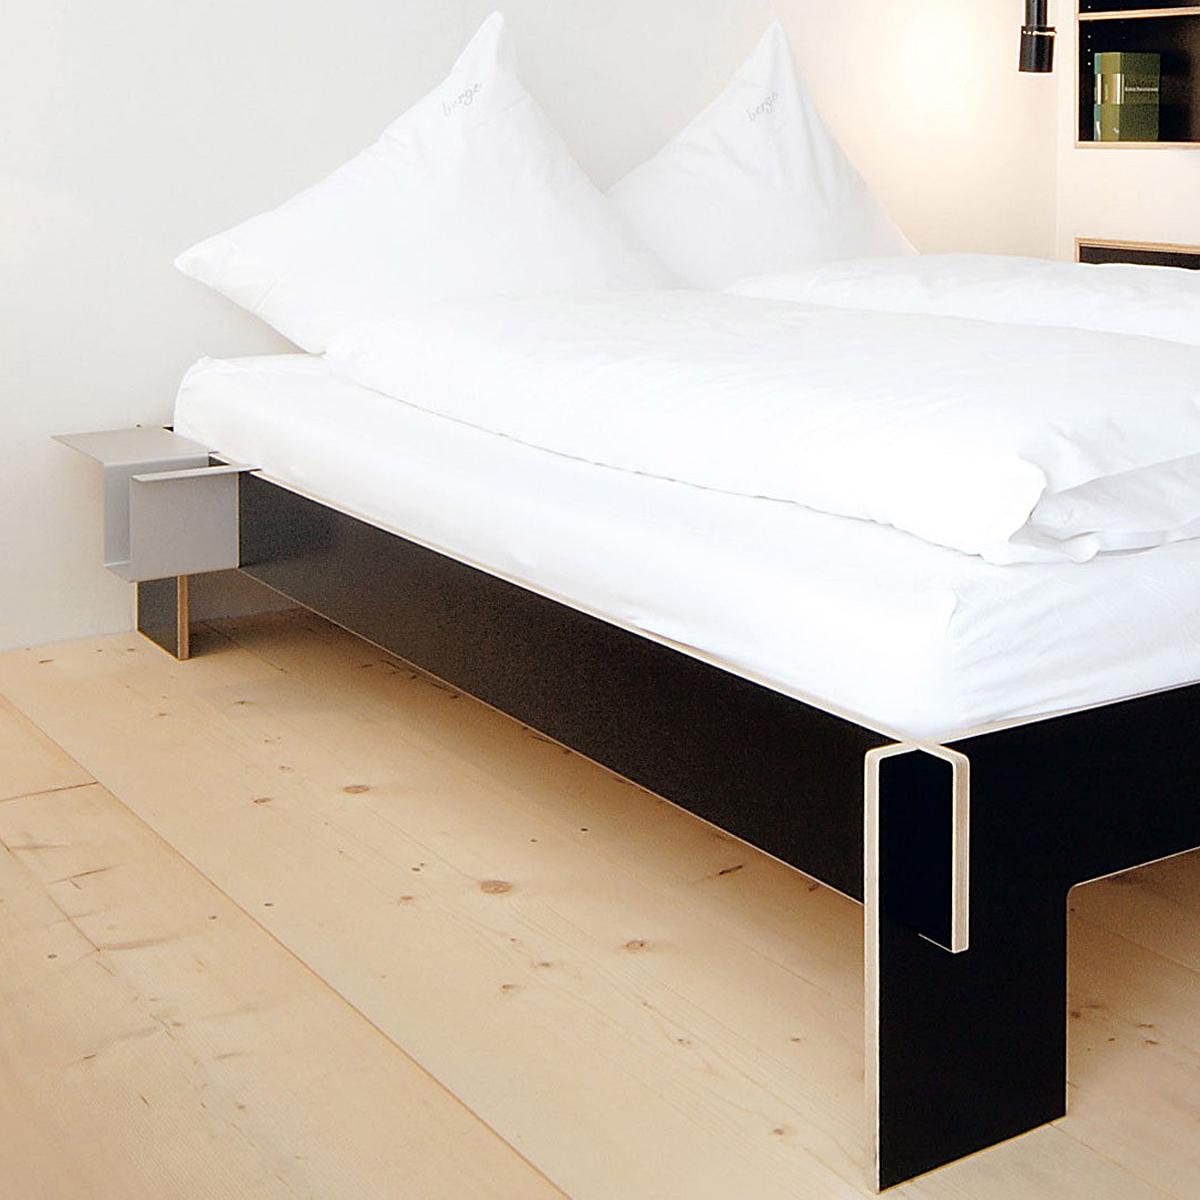 d6df4aabef NILS HOLGER MOORMANN Siebenschläfer Bett   NENNMANN form und funktion